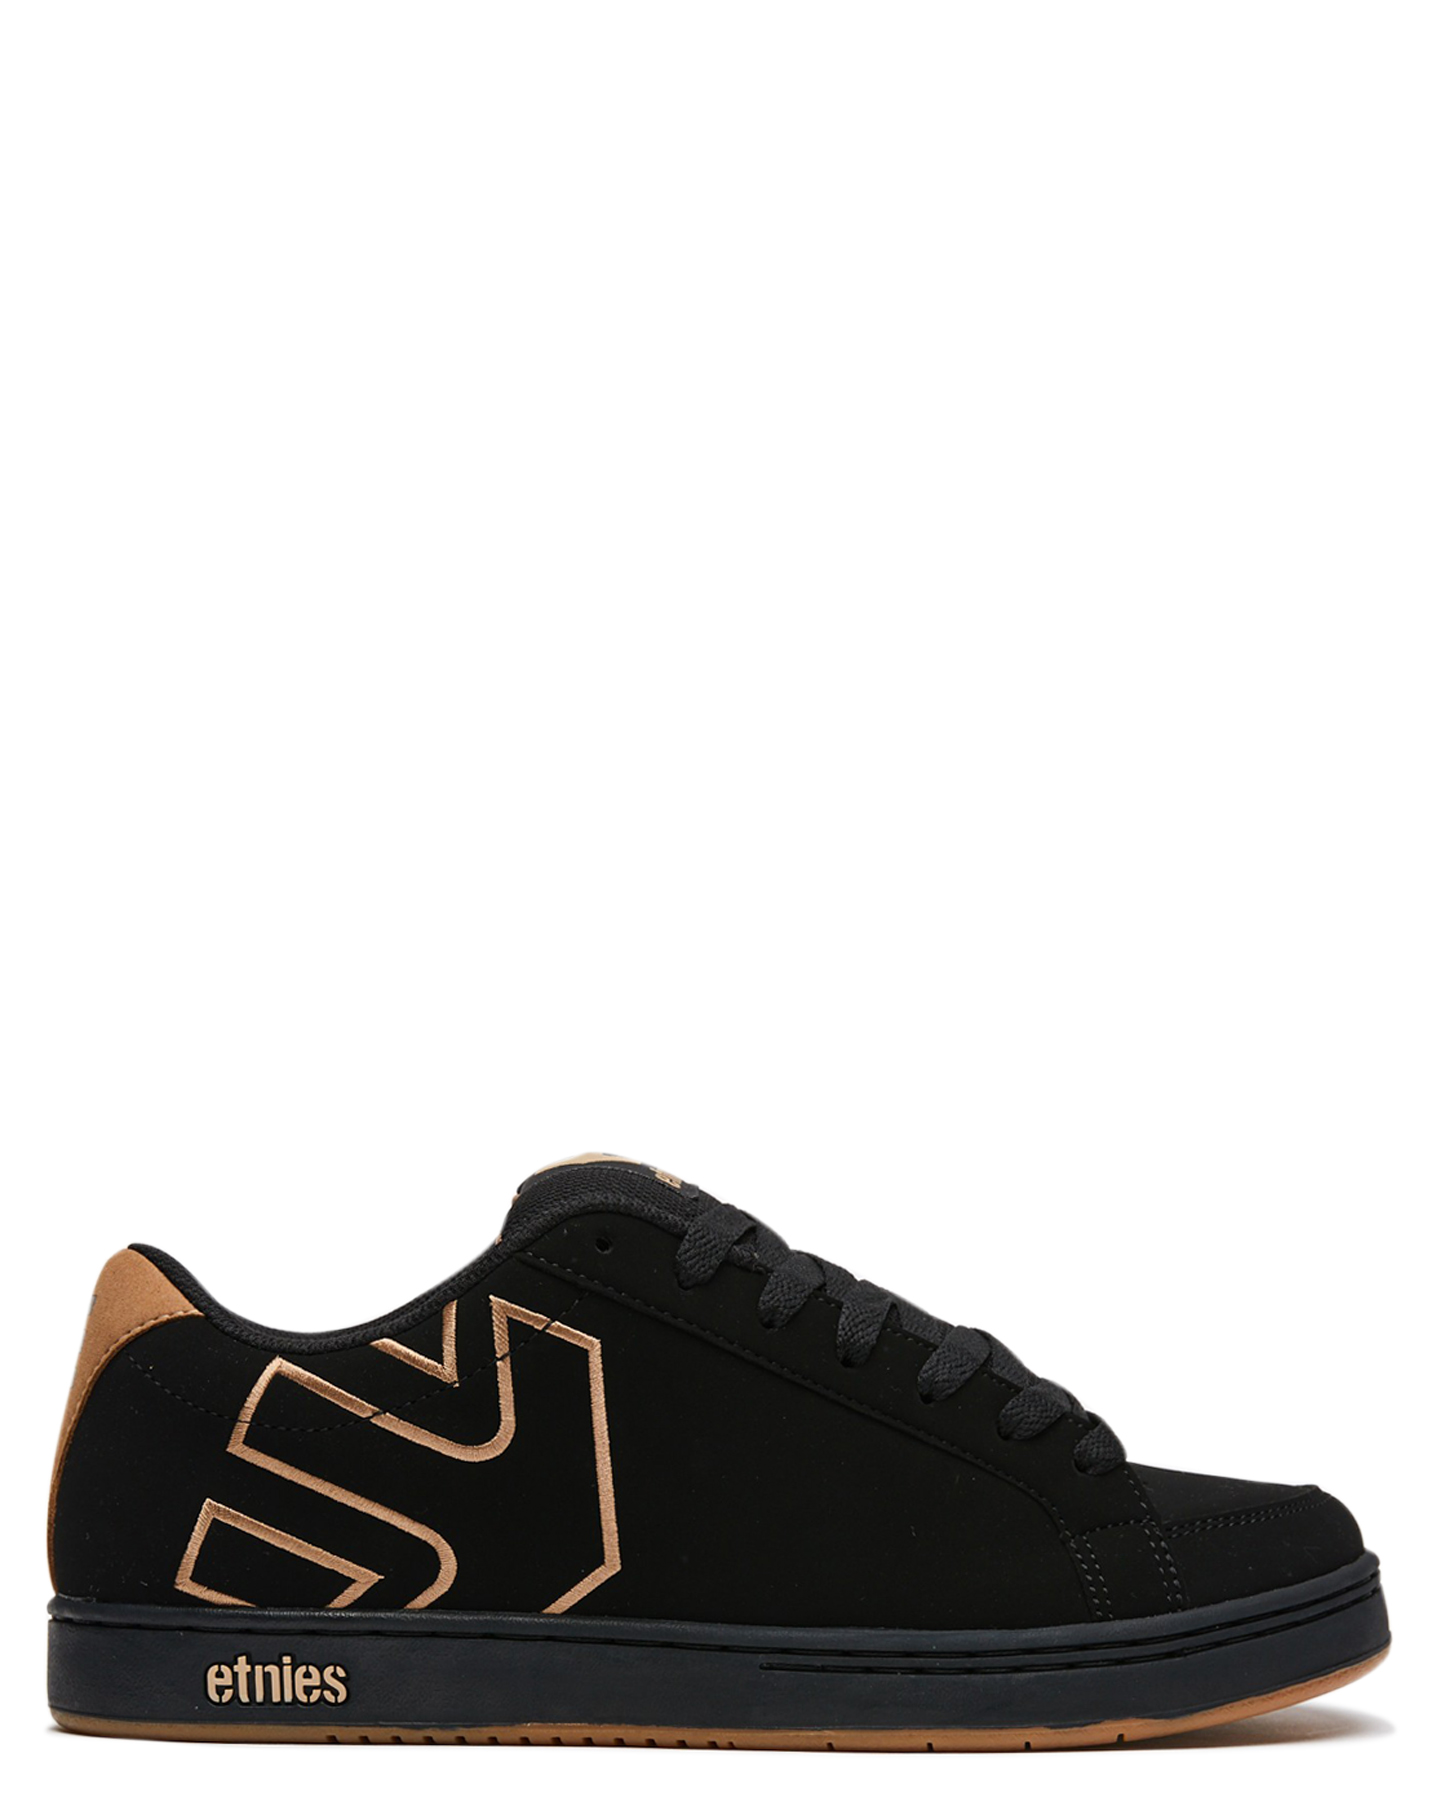 Etnies Mens Kingpin 2 Shoe Black Tan